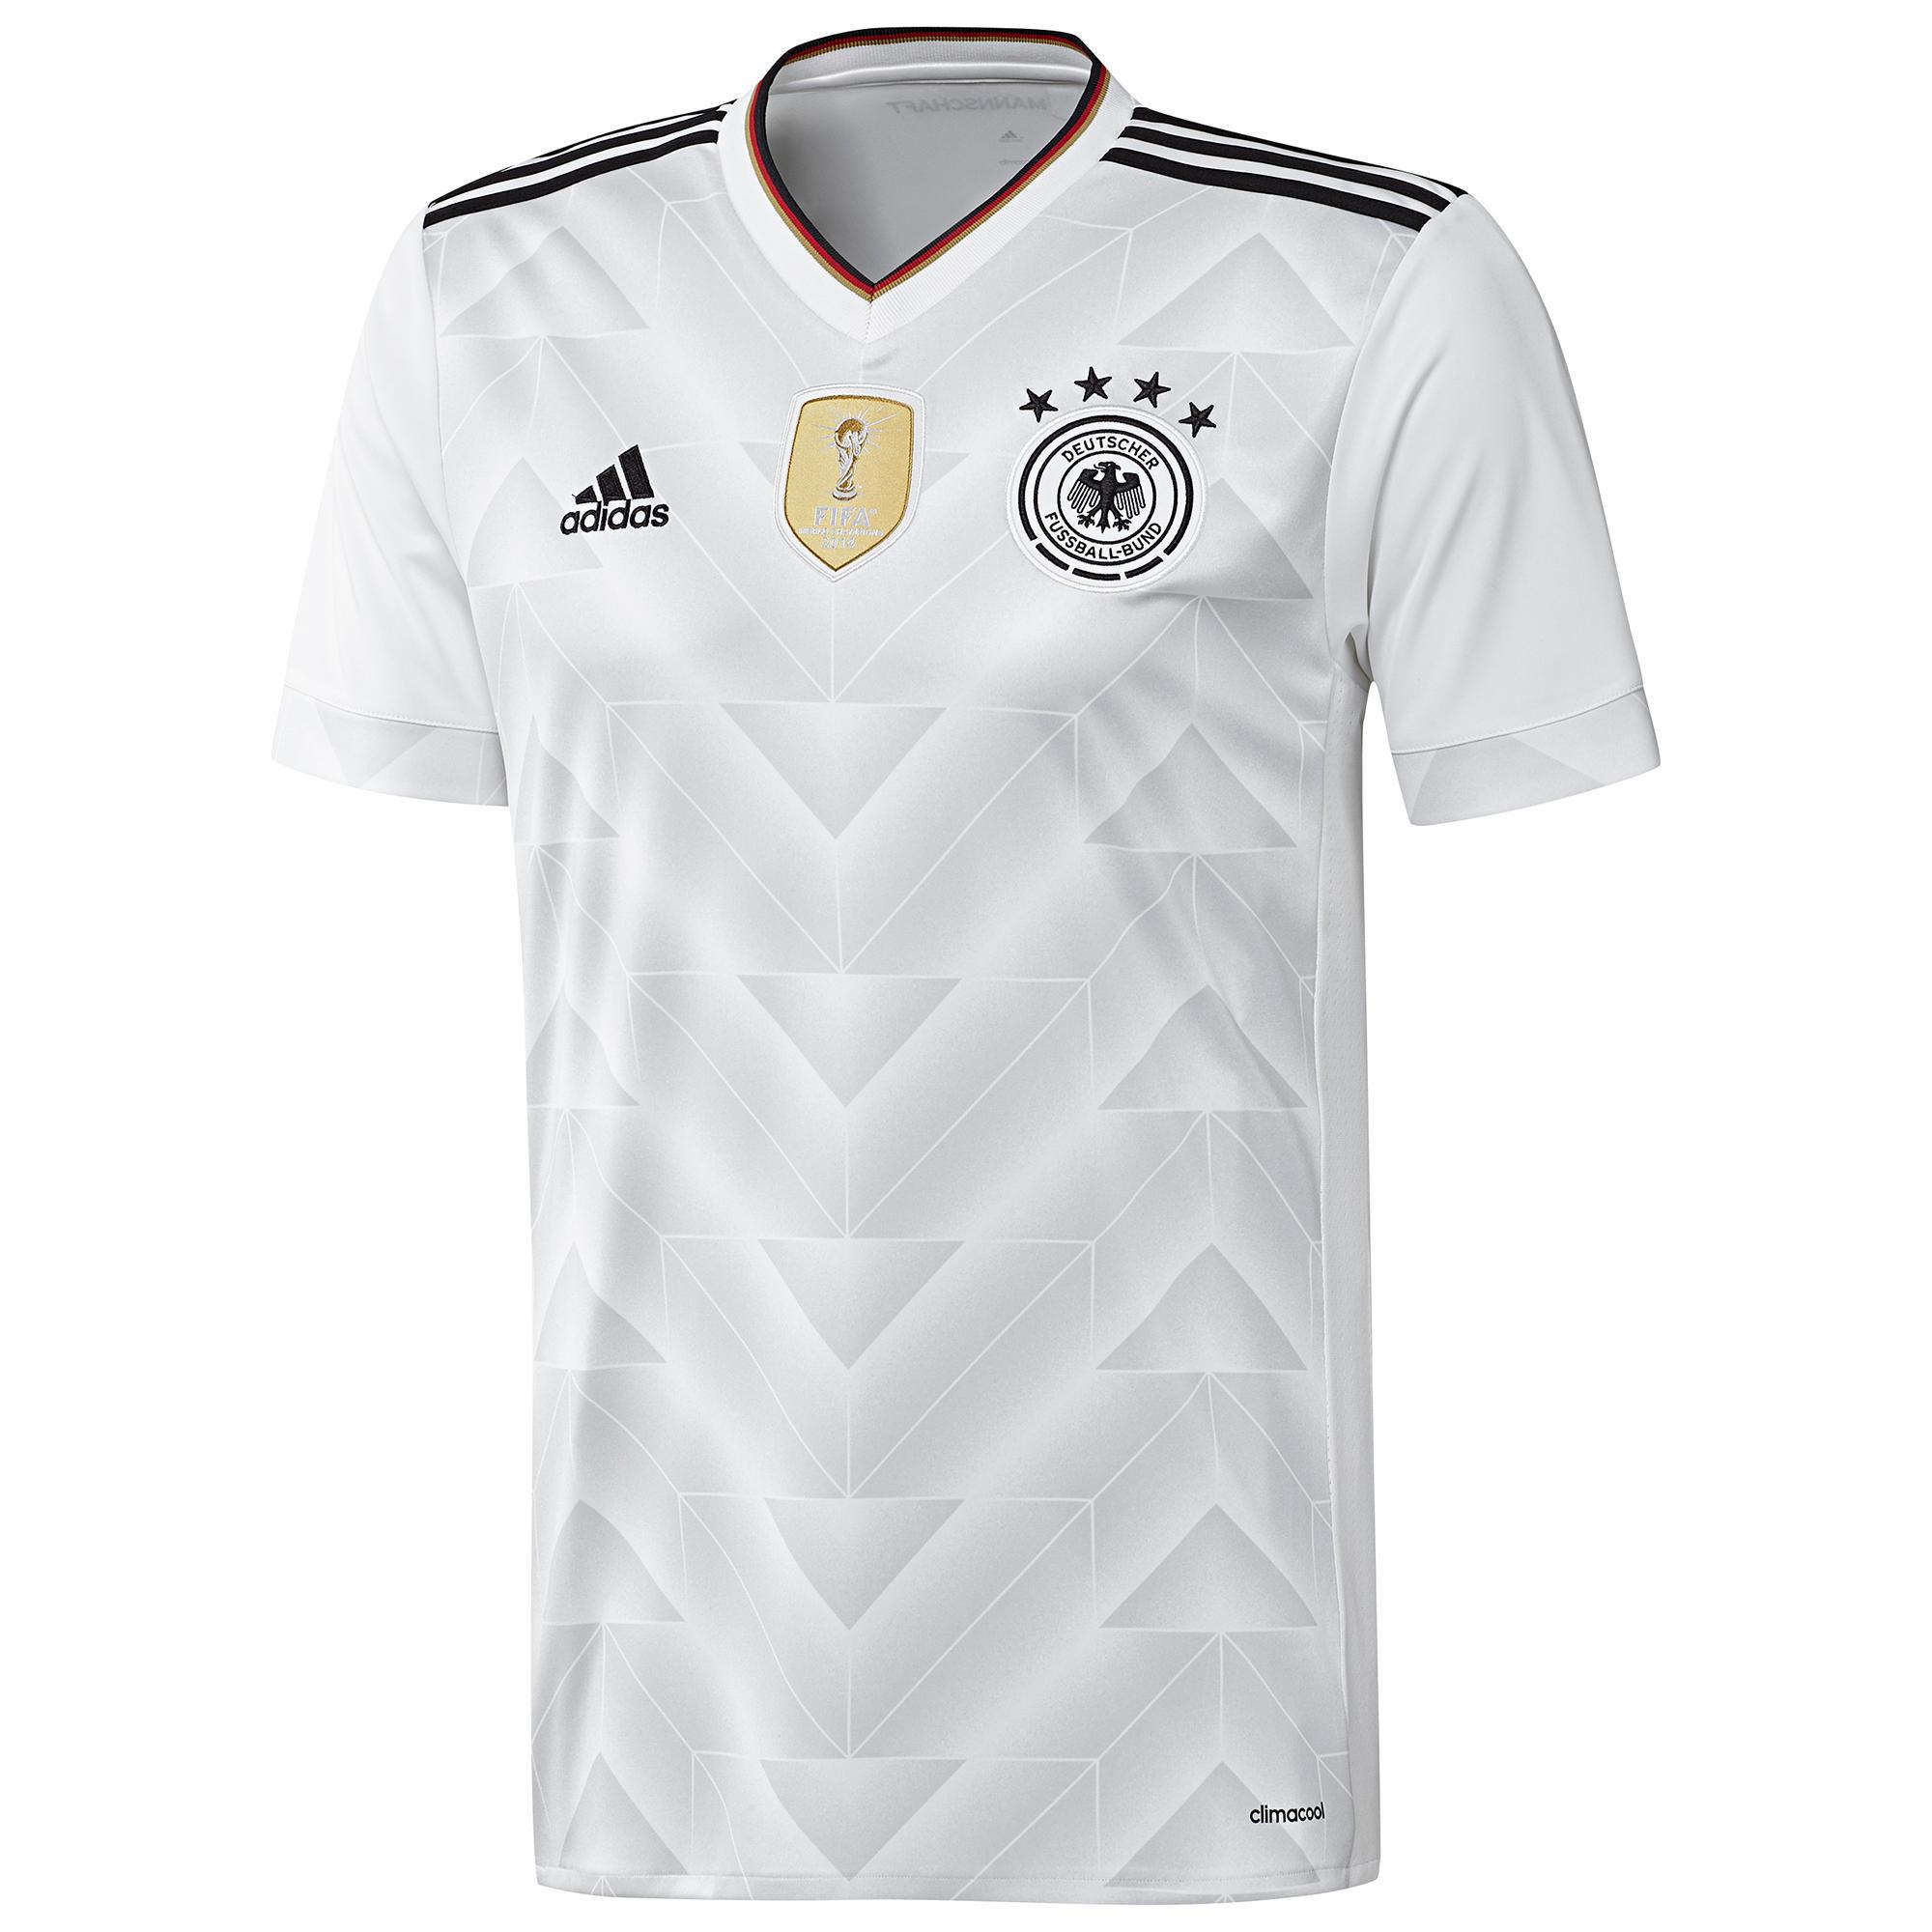 Voetbalshirt kinderen Duitsland thuisshirt 2017